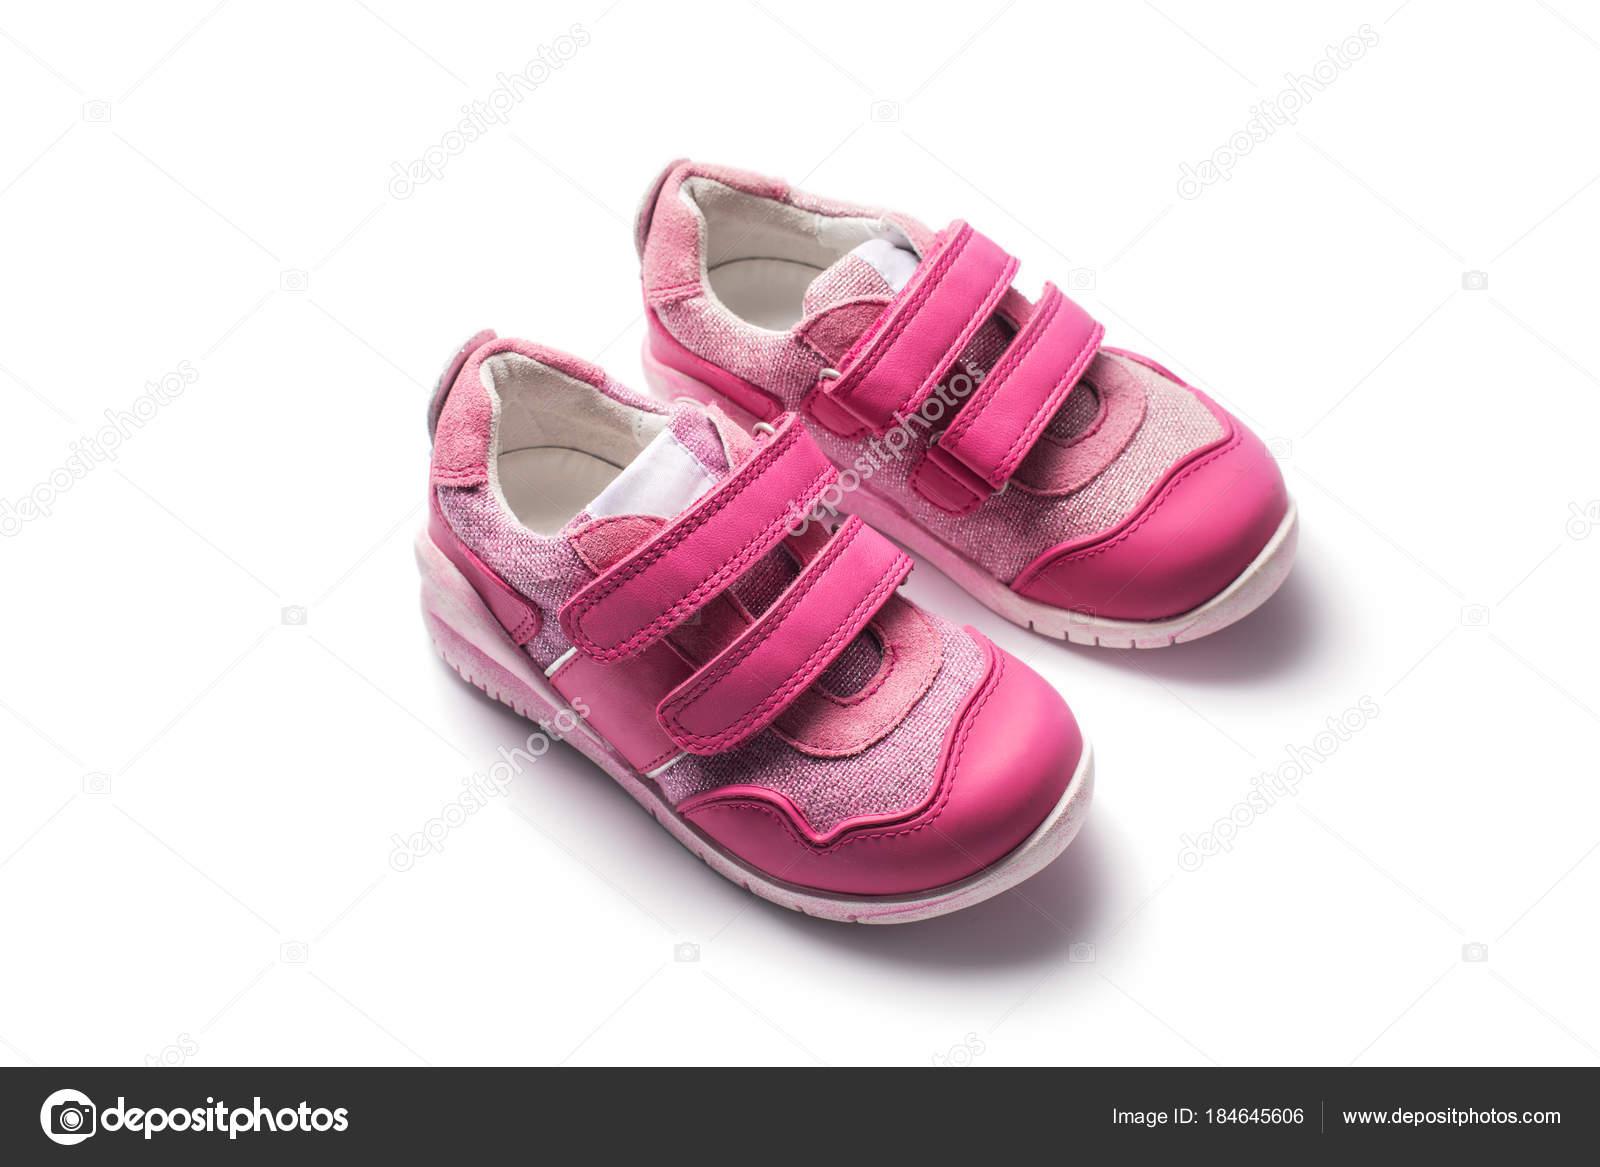 5c4b36cded4 Μωρό κορίτσι μικρό ροζ αθλητικά παπούτσια απομονωθεί σε λευκό — Φωτογραφία  Αρχείου